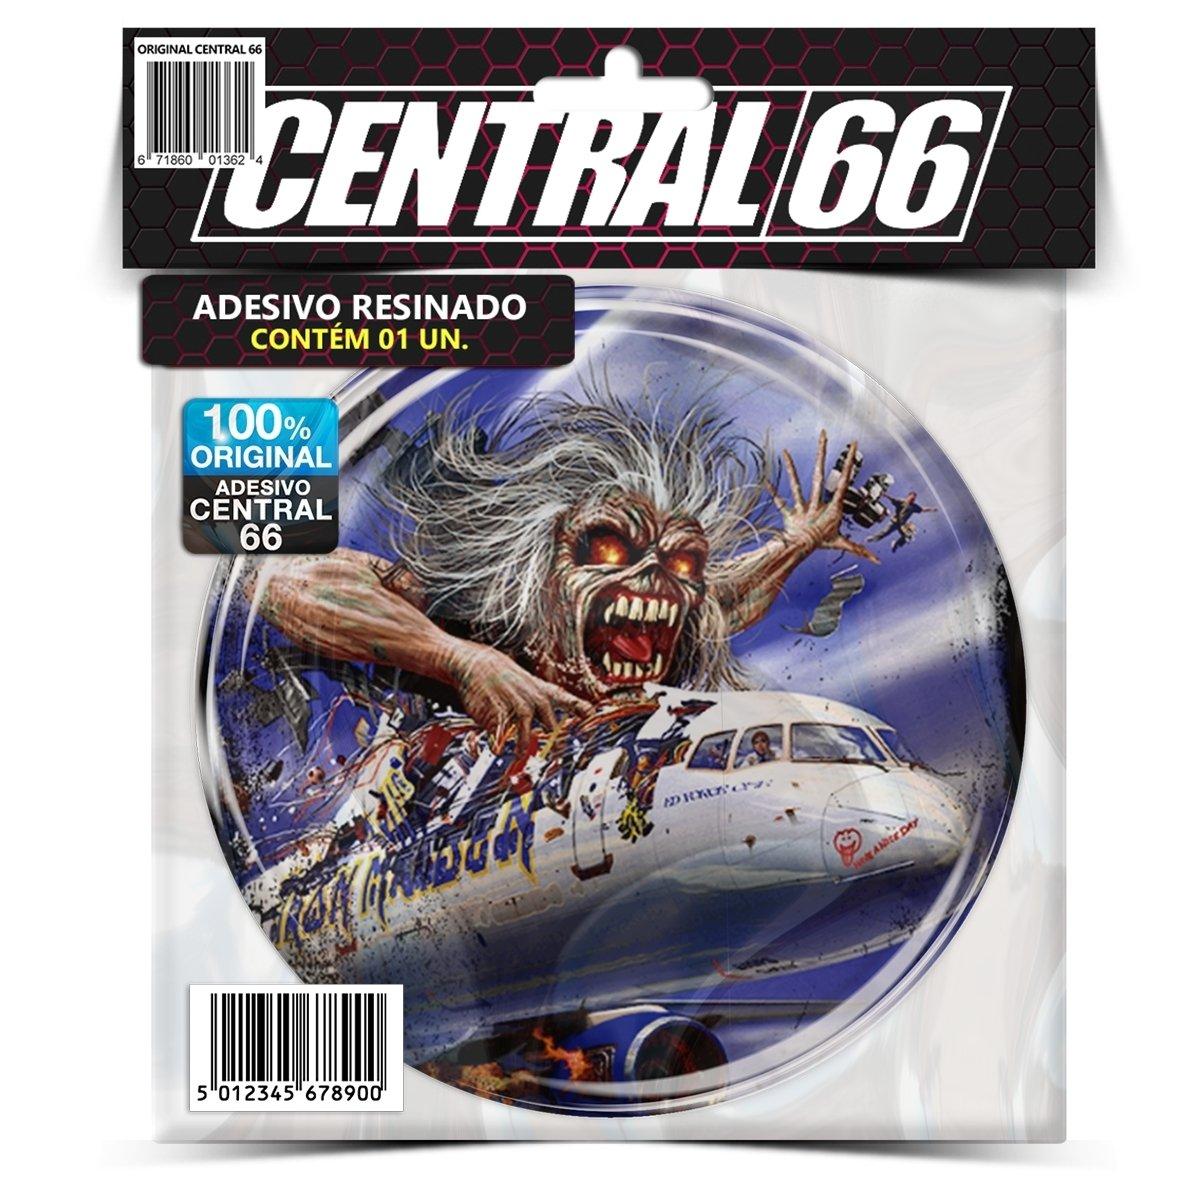 Adesivo Redondo Iron Mainde Flight 666 – Central 66